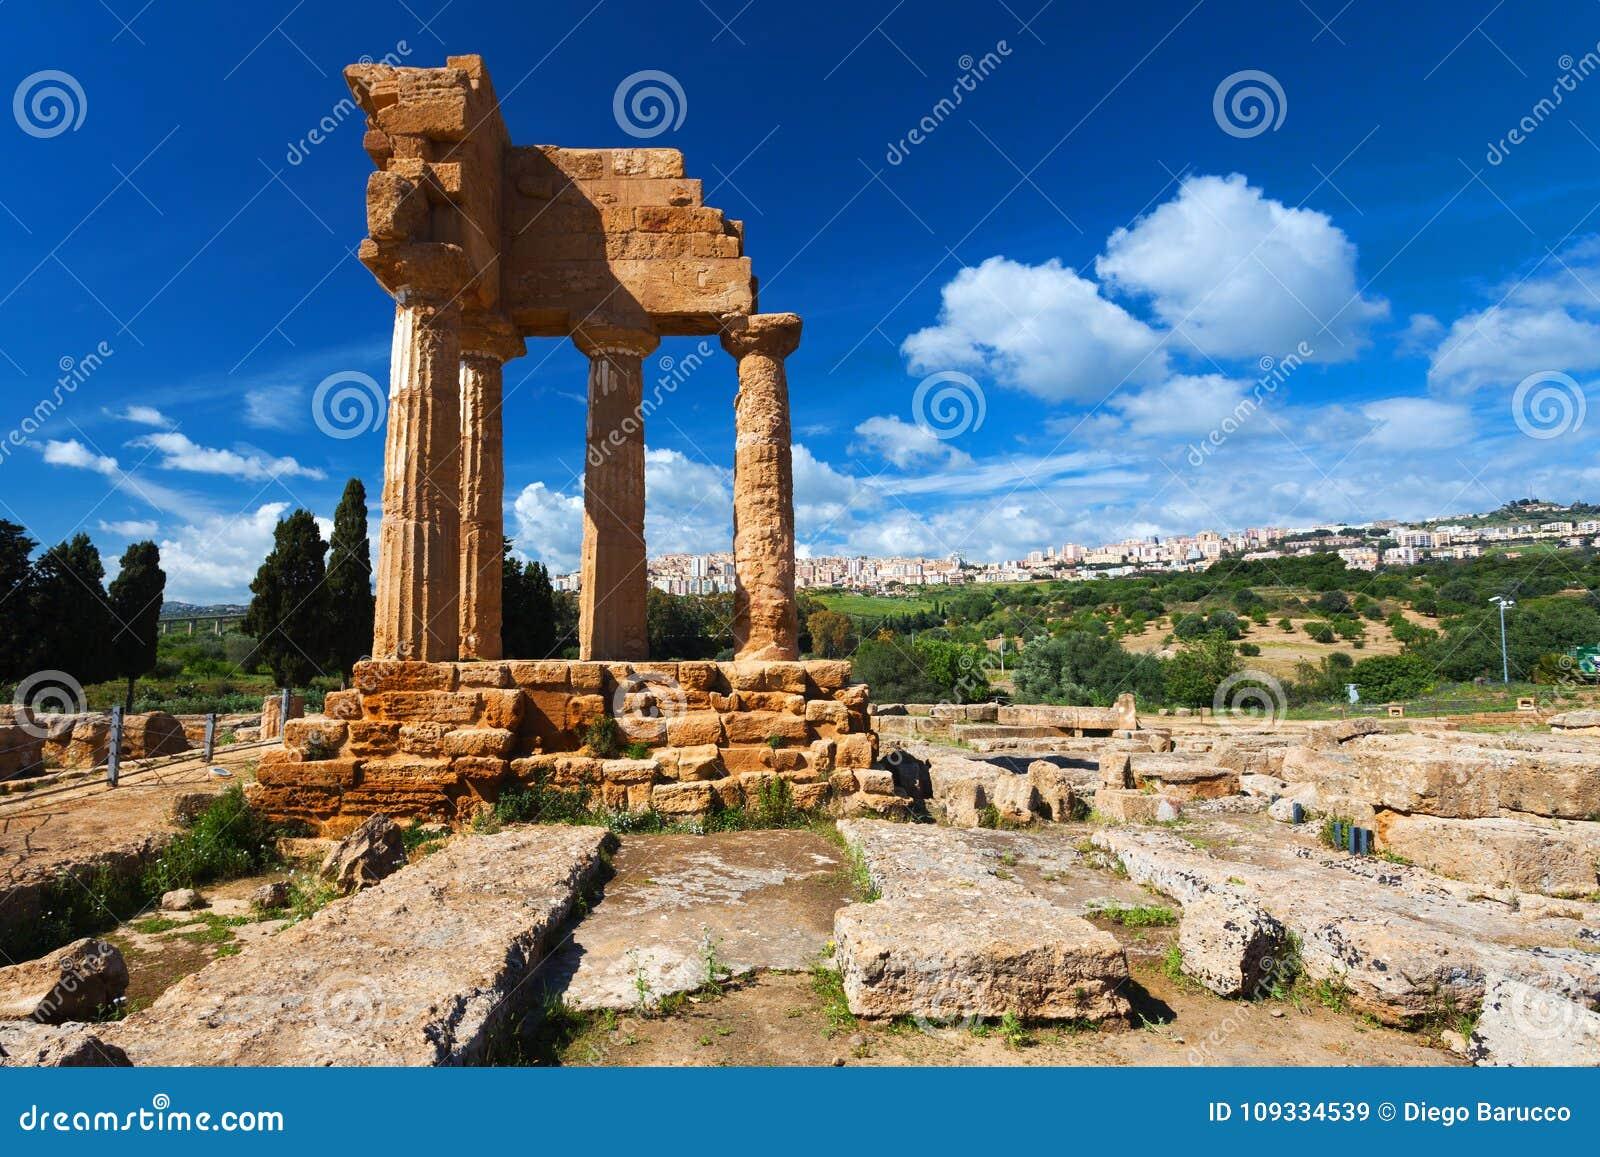 Dioscuri-Tempel in archäologischem Park Argrigento in Sizilien